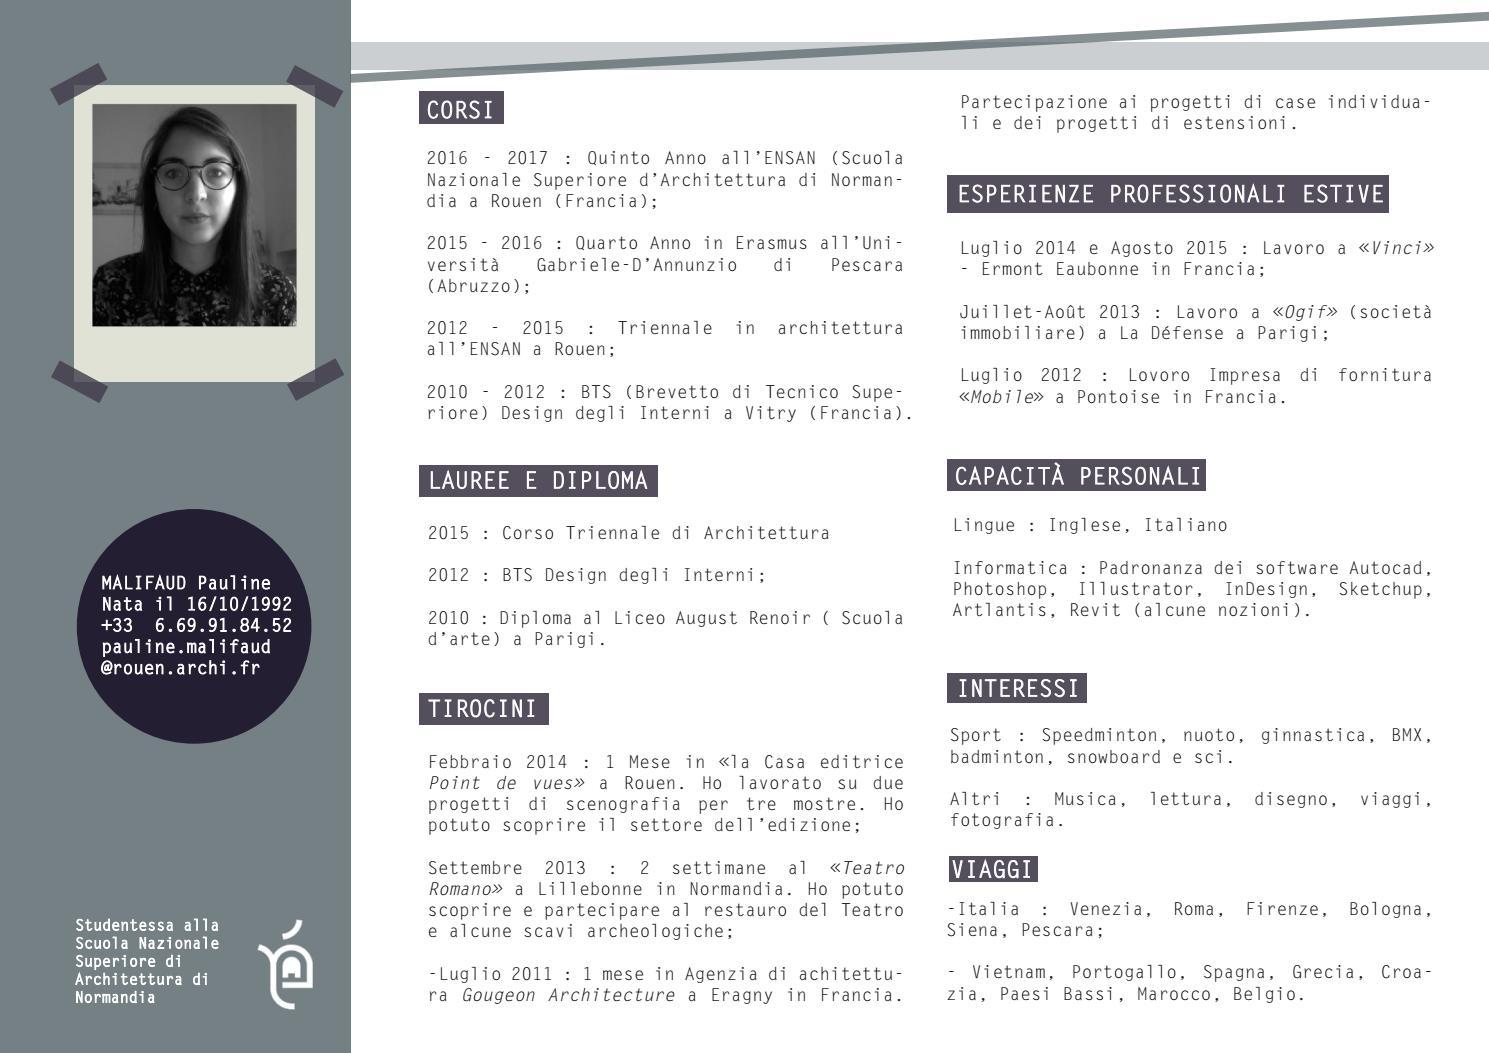 Design Degli Interni Roma cv - portfolio by pauline - issuu